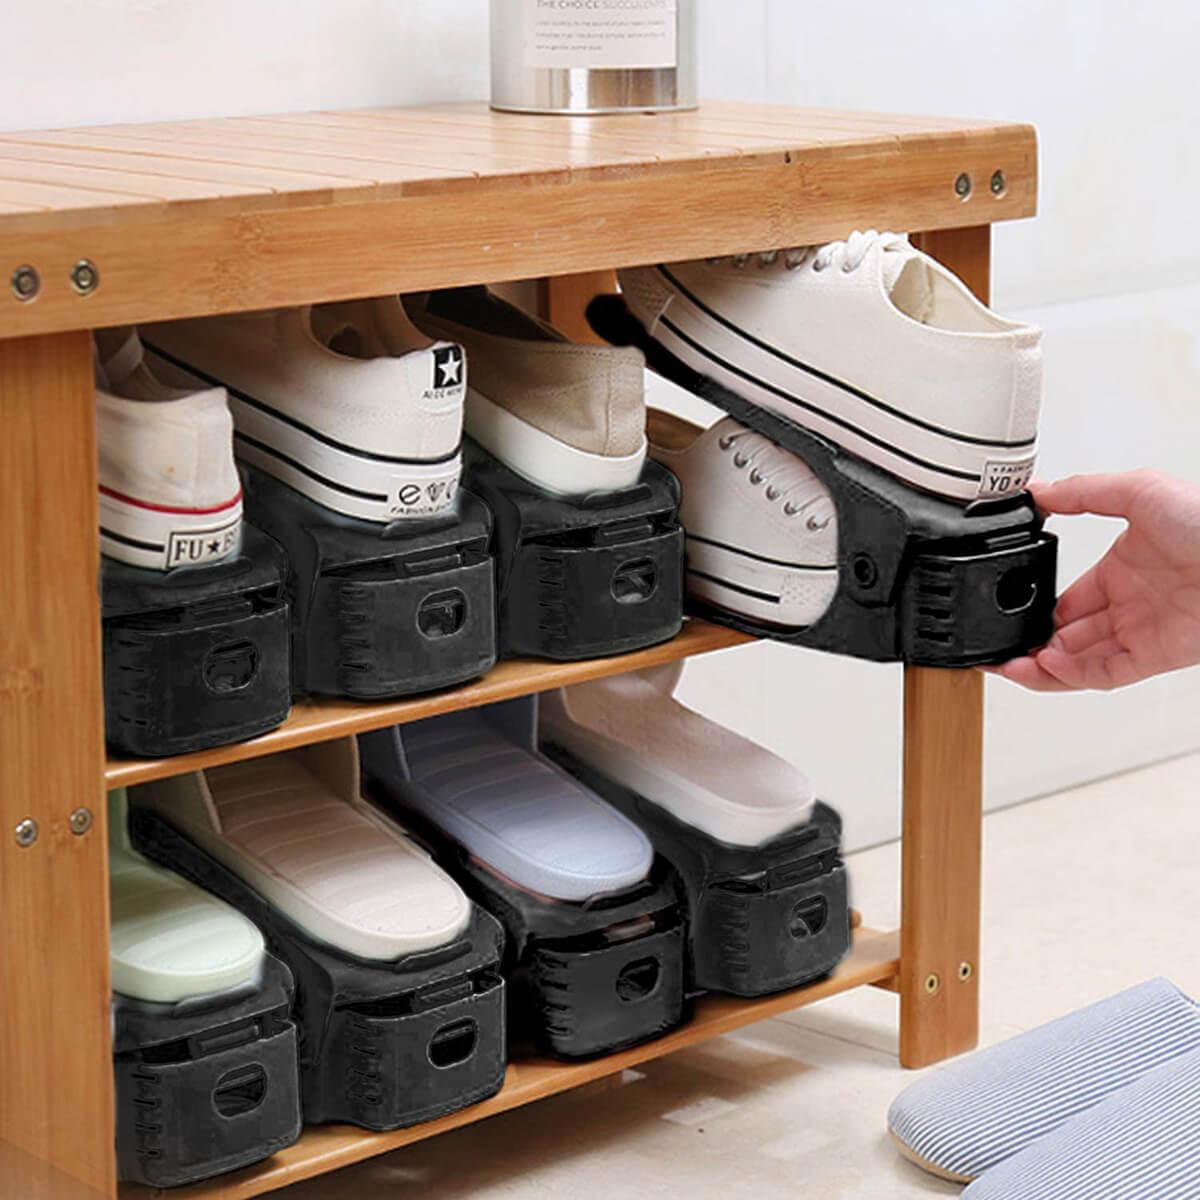 Adjustable Two-Level Shoe Storage Decks